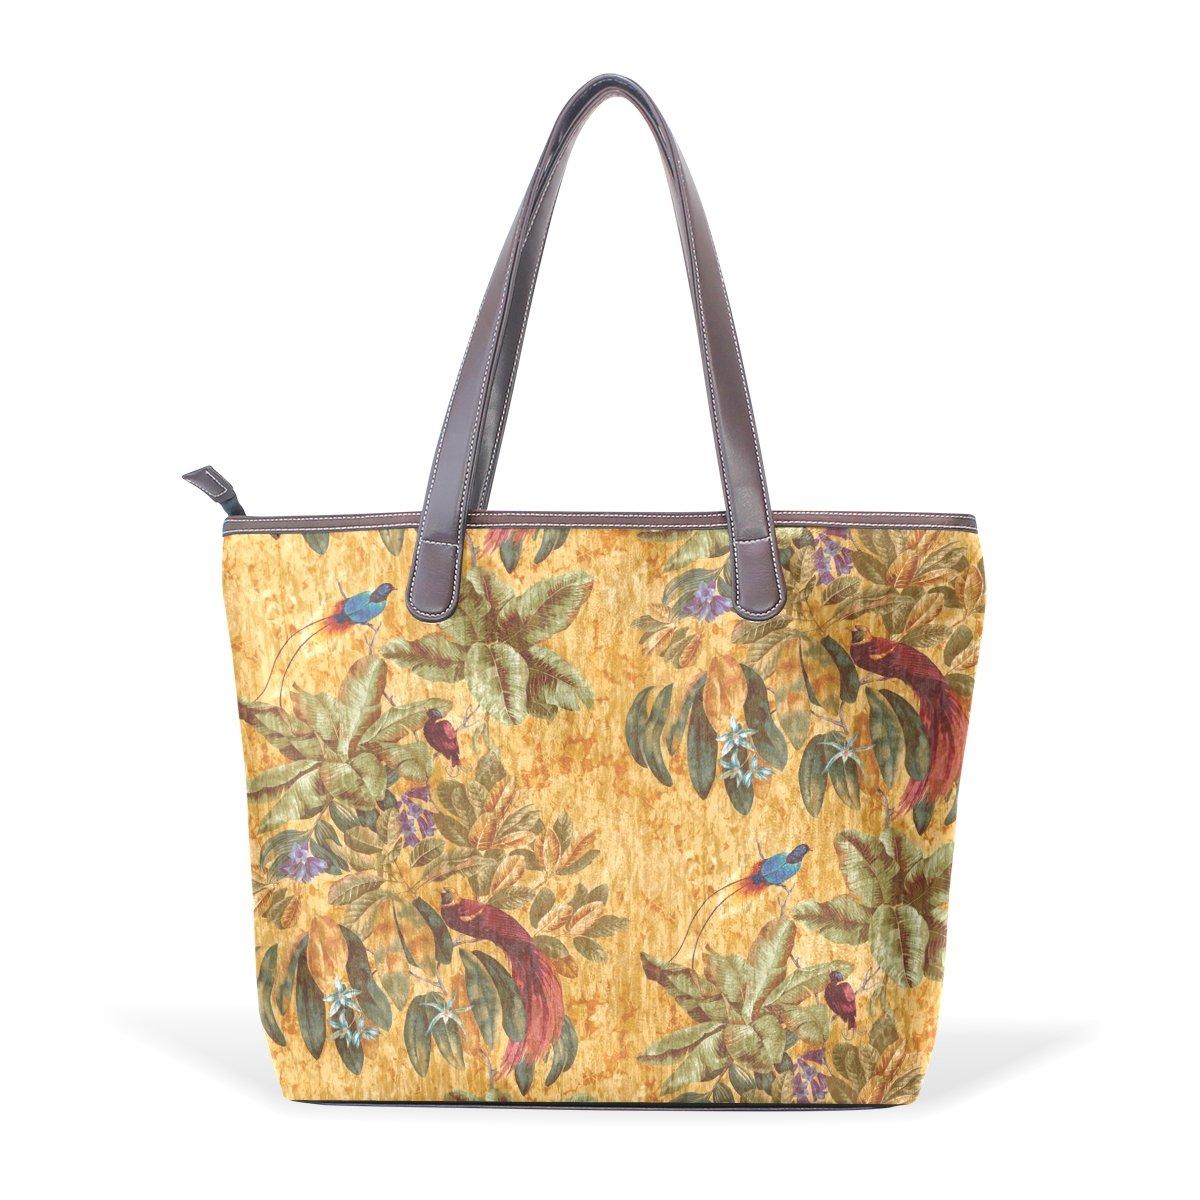 Ye Store Birds Of Paradise Copper Lady PU Leather Handbag Tote Bag Shoulder Bag Shopping Bag